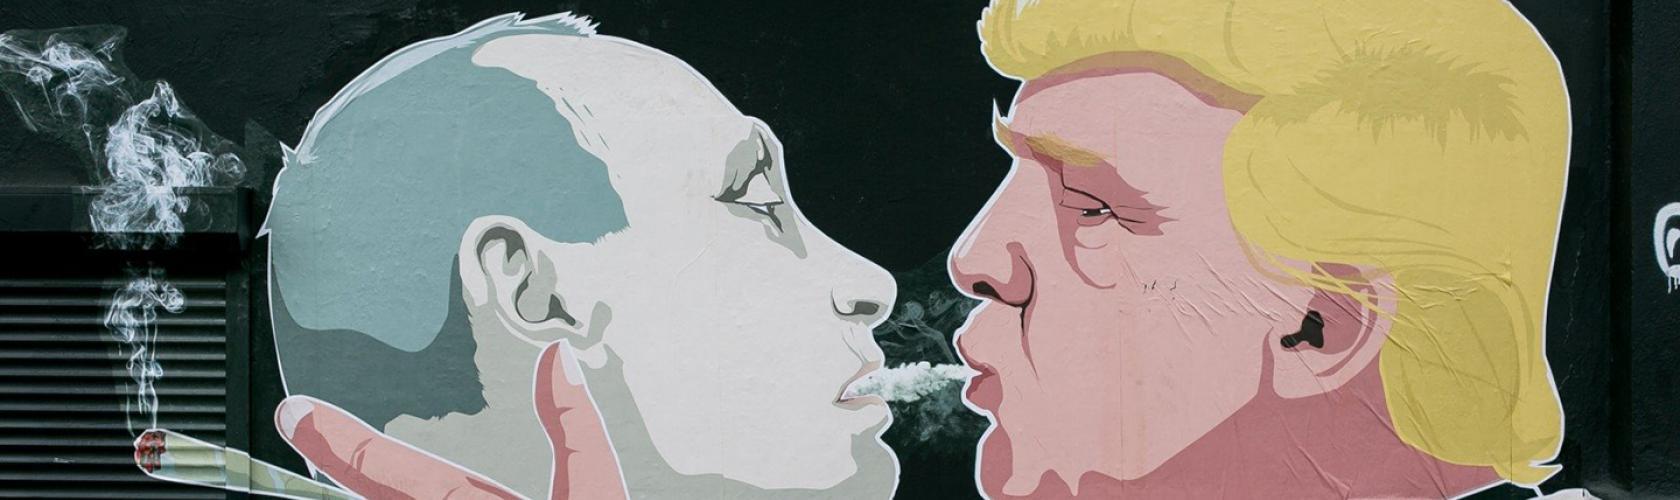 The Strange Roots Of The Homophobic Trump Putin Kissing Meme Frieze